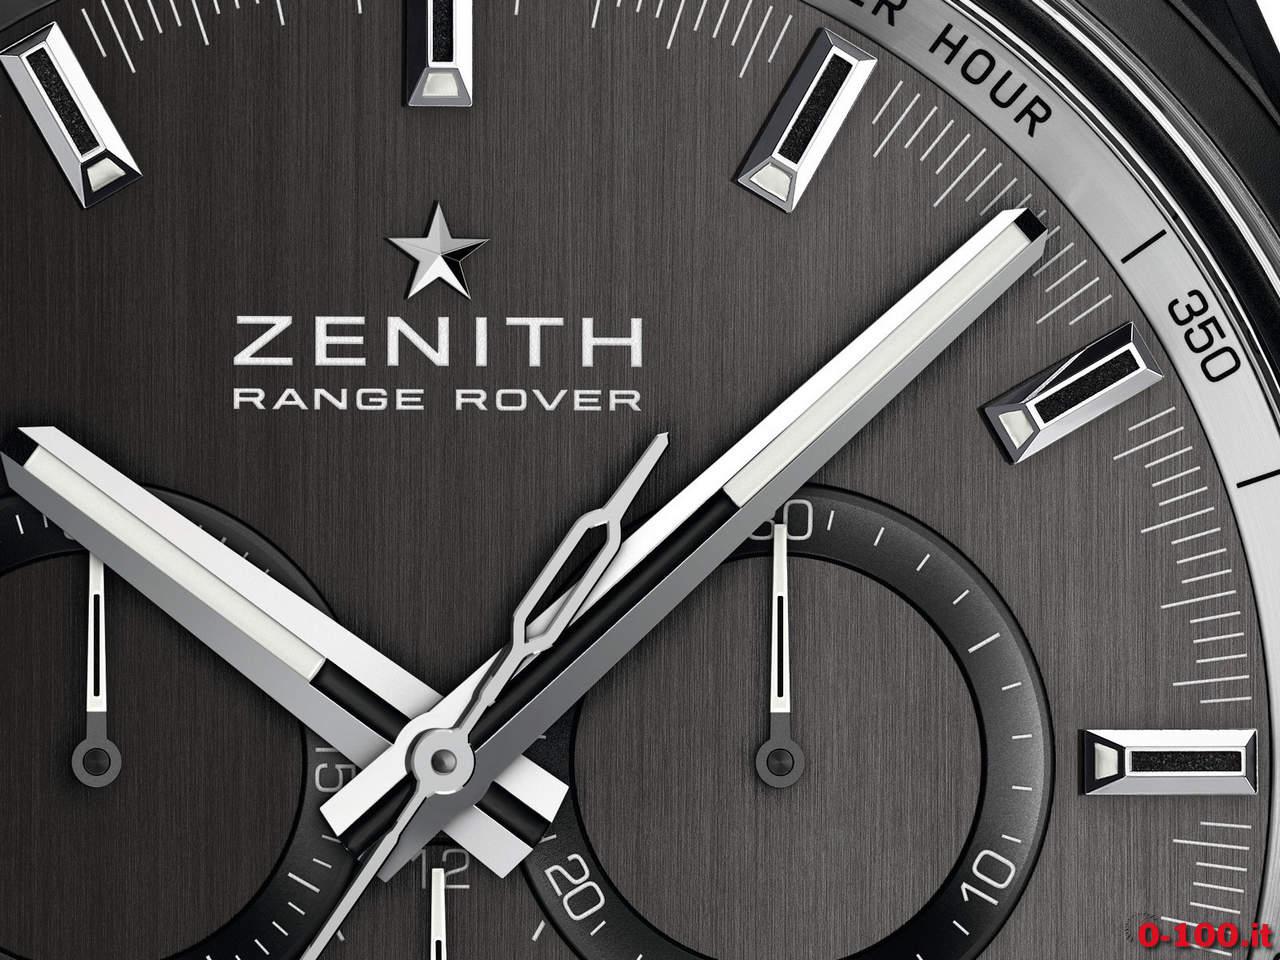 zenith-el-primero-range-rover-prezzo-price_0-100_14